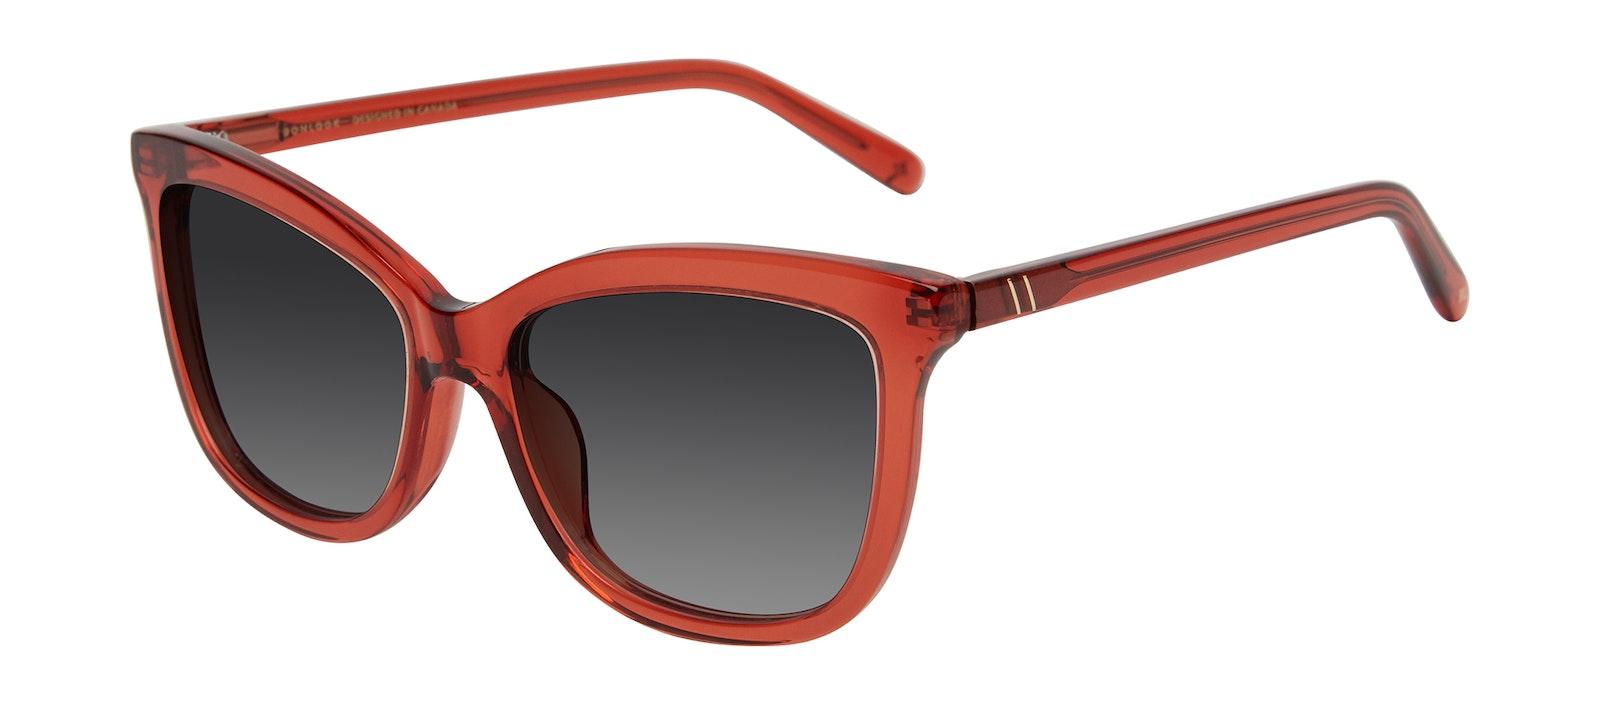 Affordable Fashion Glasses Cat Eye Sunglasses Women Paparazzi Brick Tilt